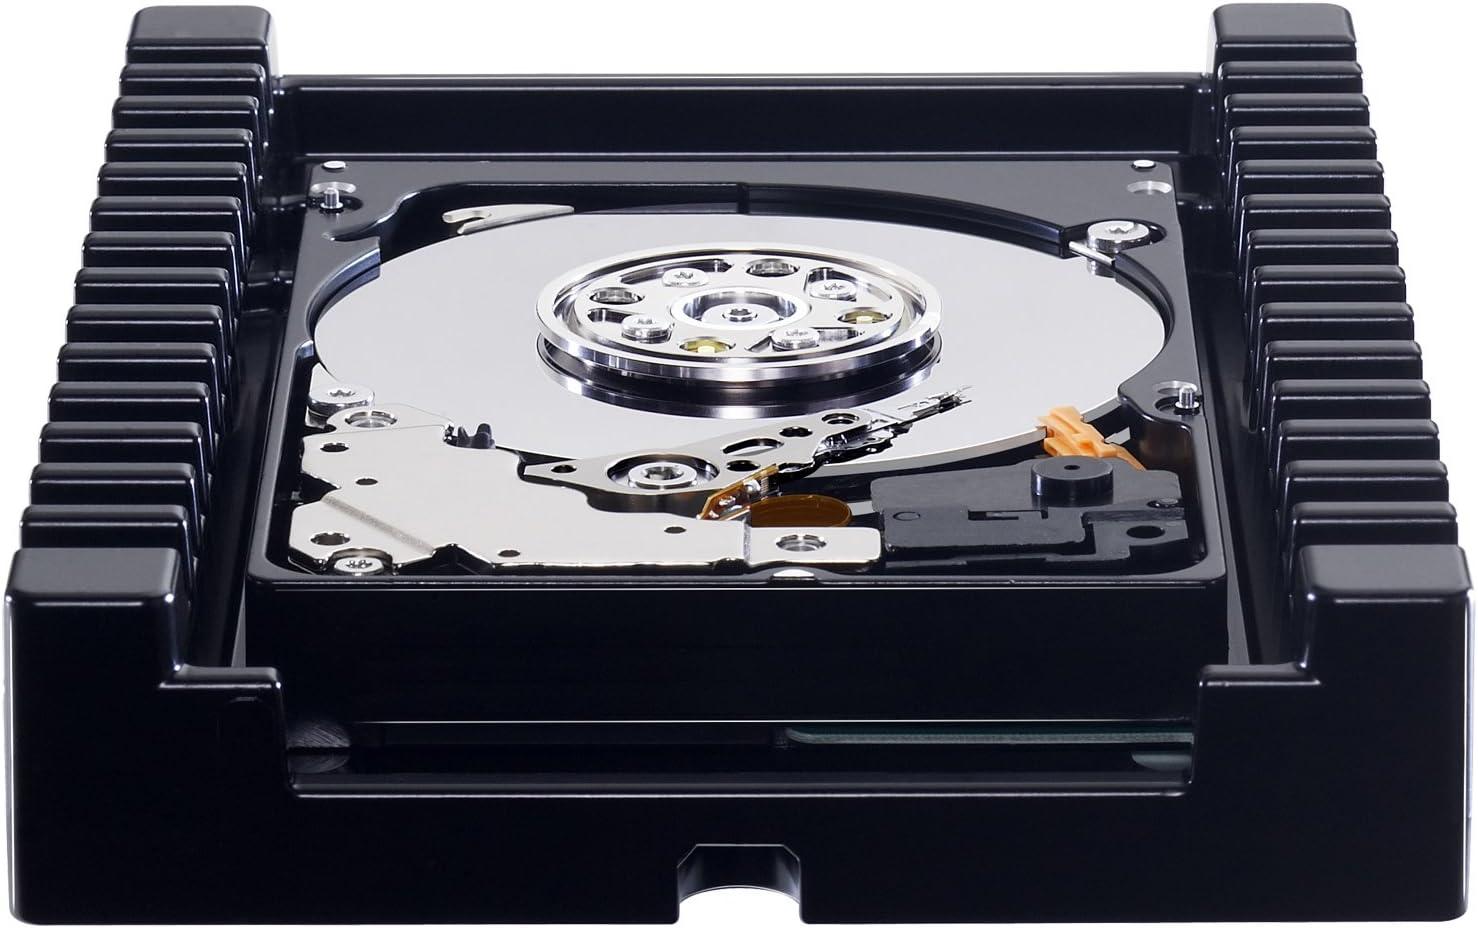 32 MB Cache WD VelociRaptor 300 GB Workstation Hard Drive: 2.5 Inch WD3000BLHX 10000 RPM SATA III